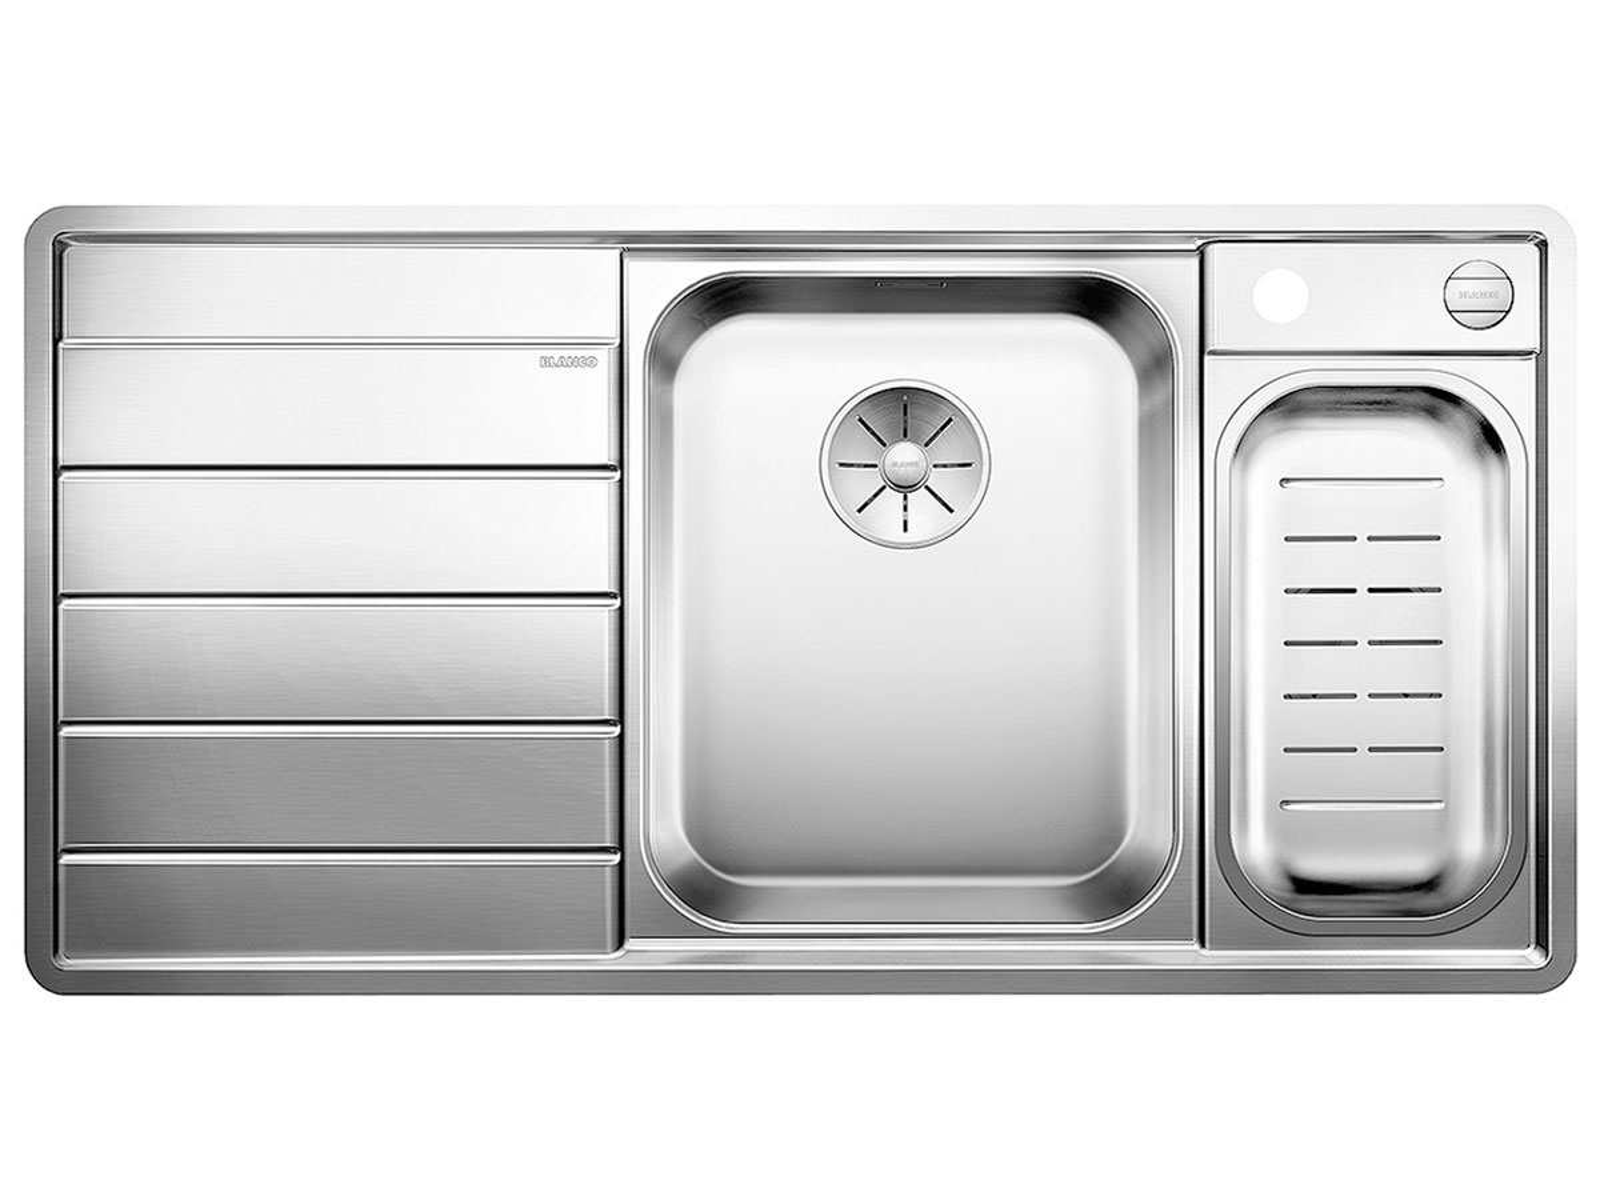 Blanco Axis III 6 S-IF Edition Edelstahlspüle Seidenglanz 522106 Becken rechts